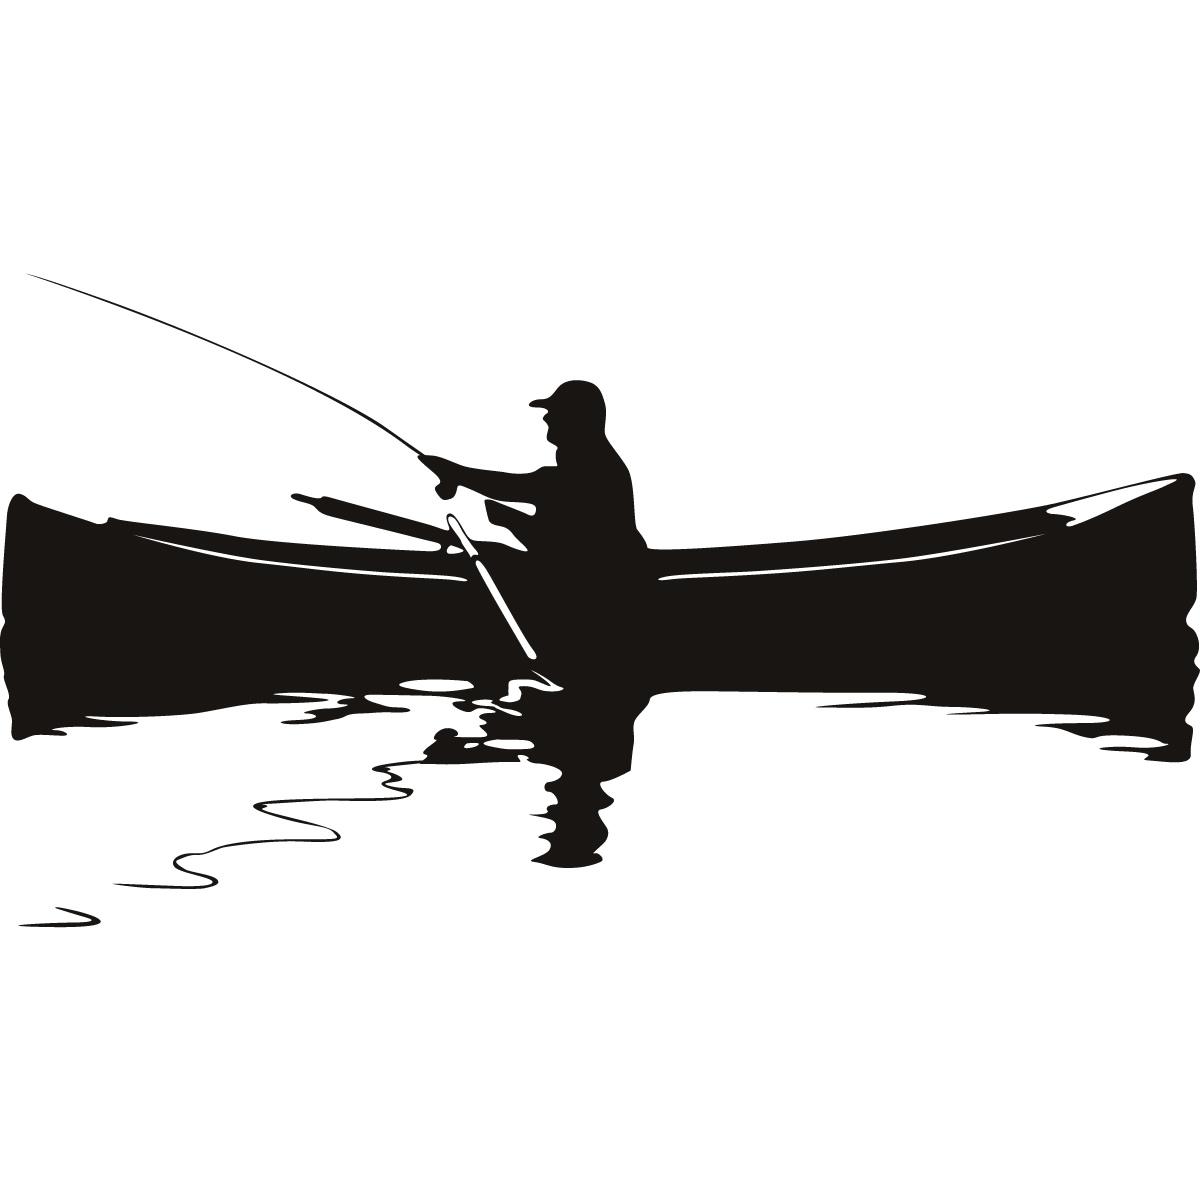 Similiar Guy In Boat Fishing Keywords.